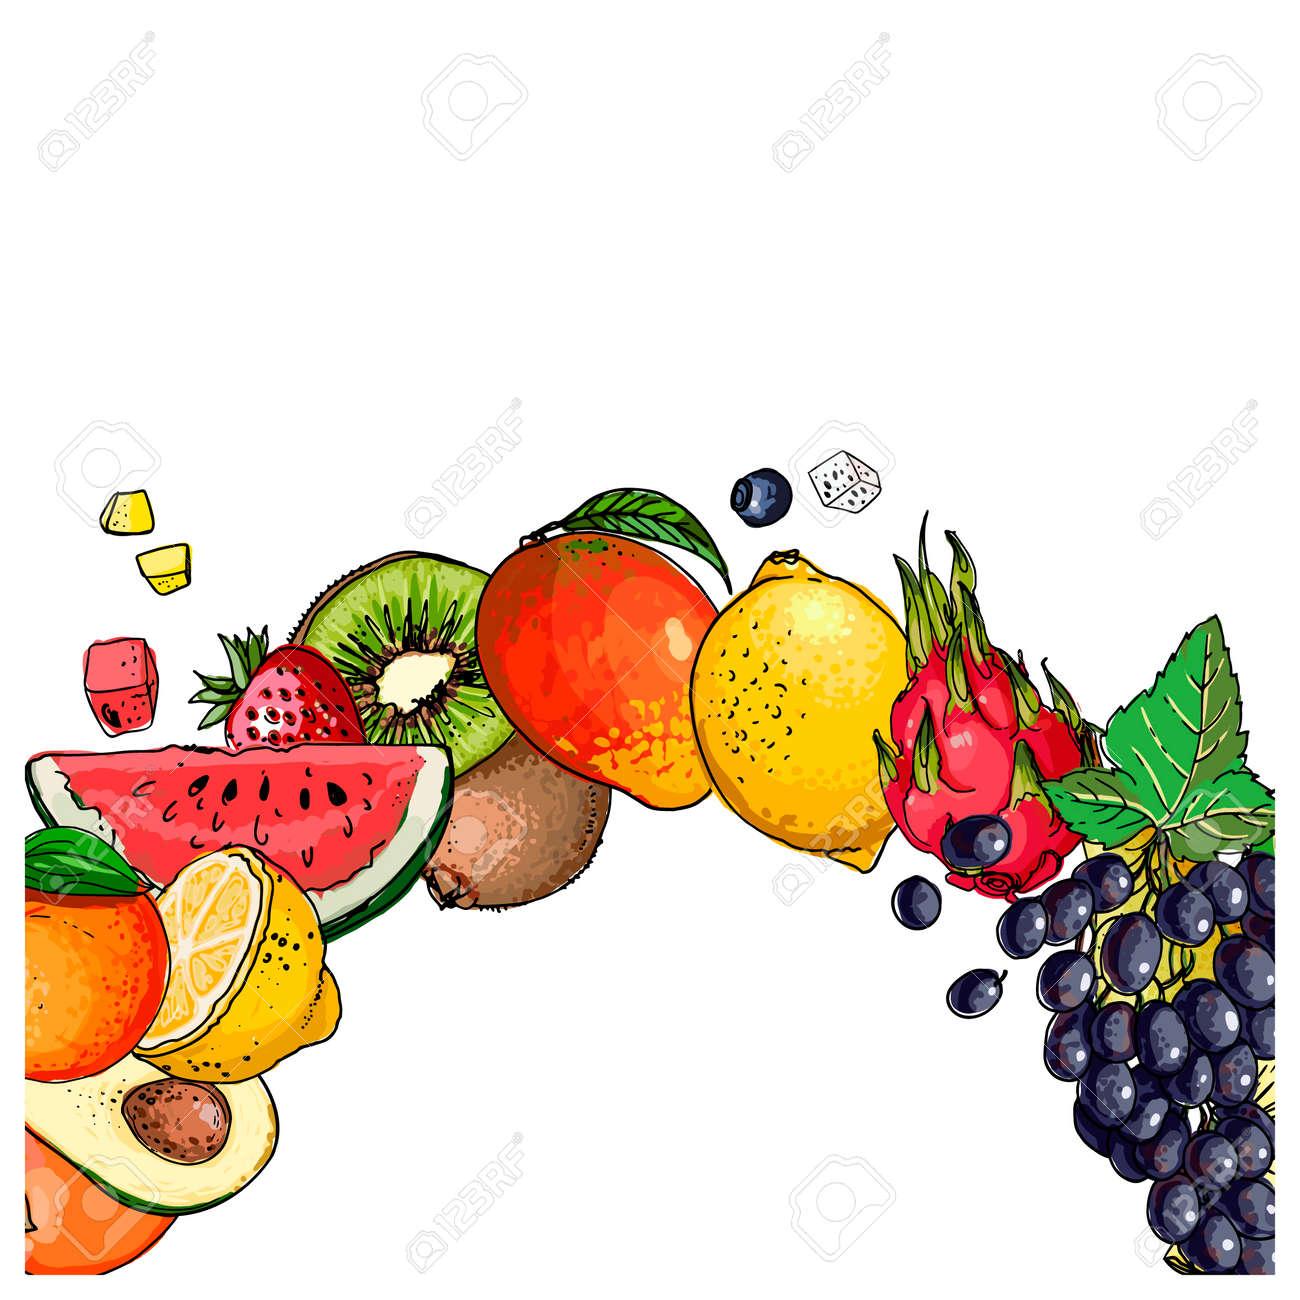 Fresh food. Watermelon, cantaloupe, pomegranate, apricot, persimmon line drawn on a white background. Vector illustration. - 165991008